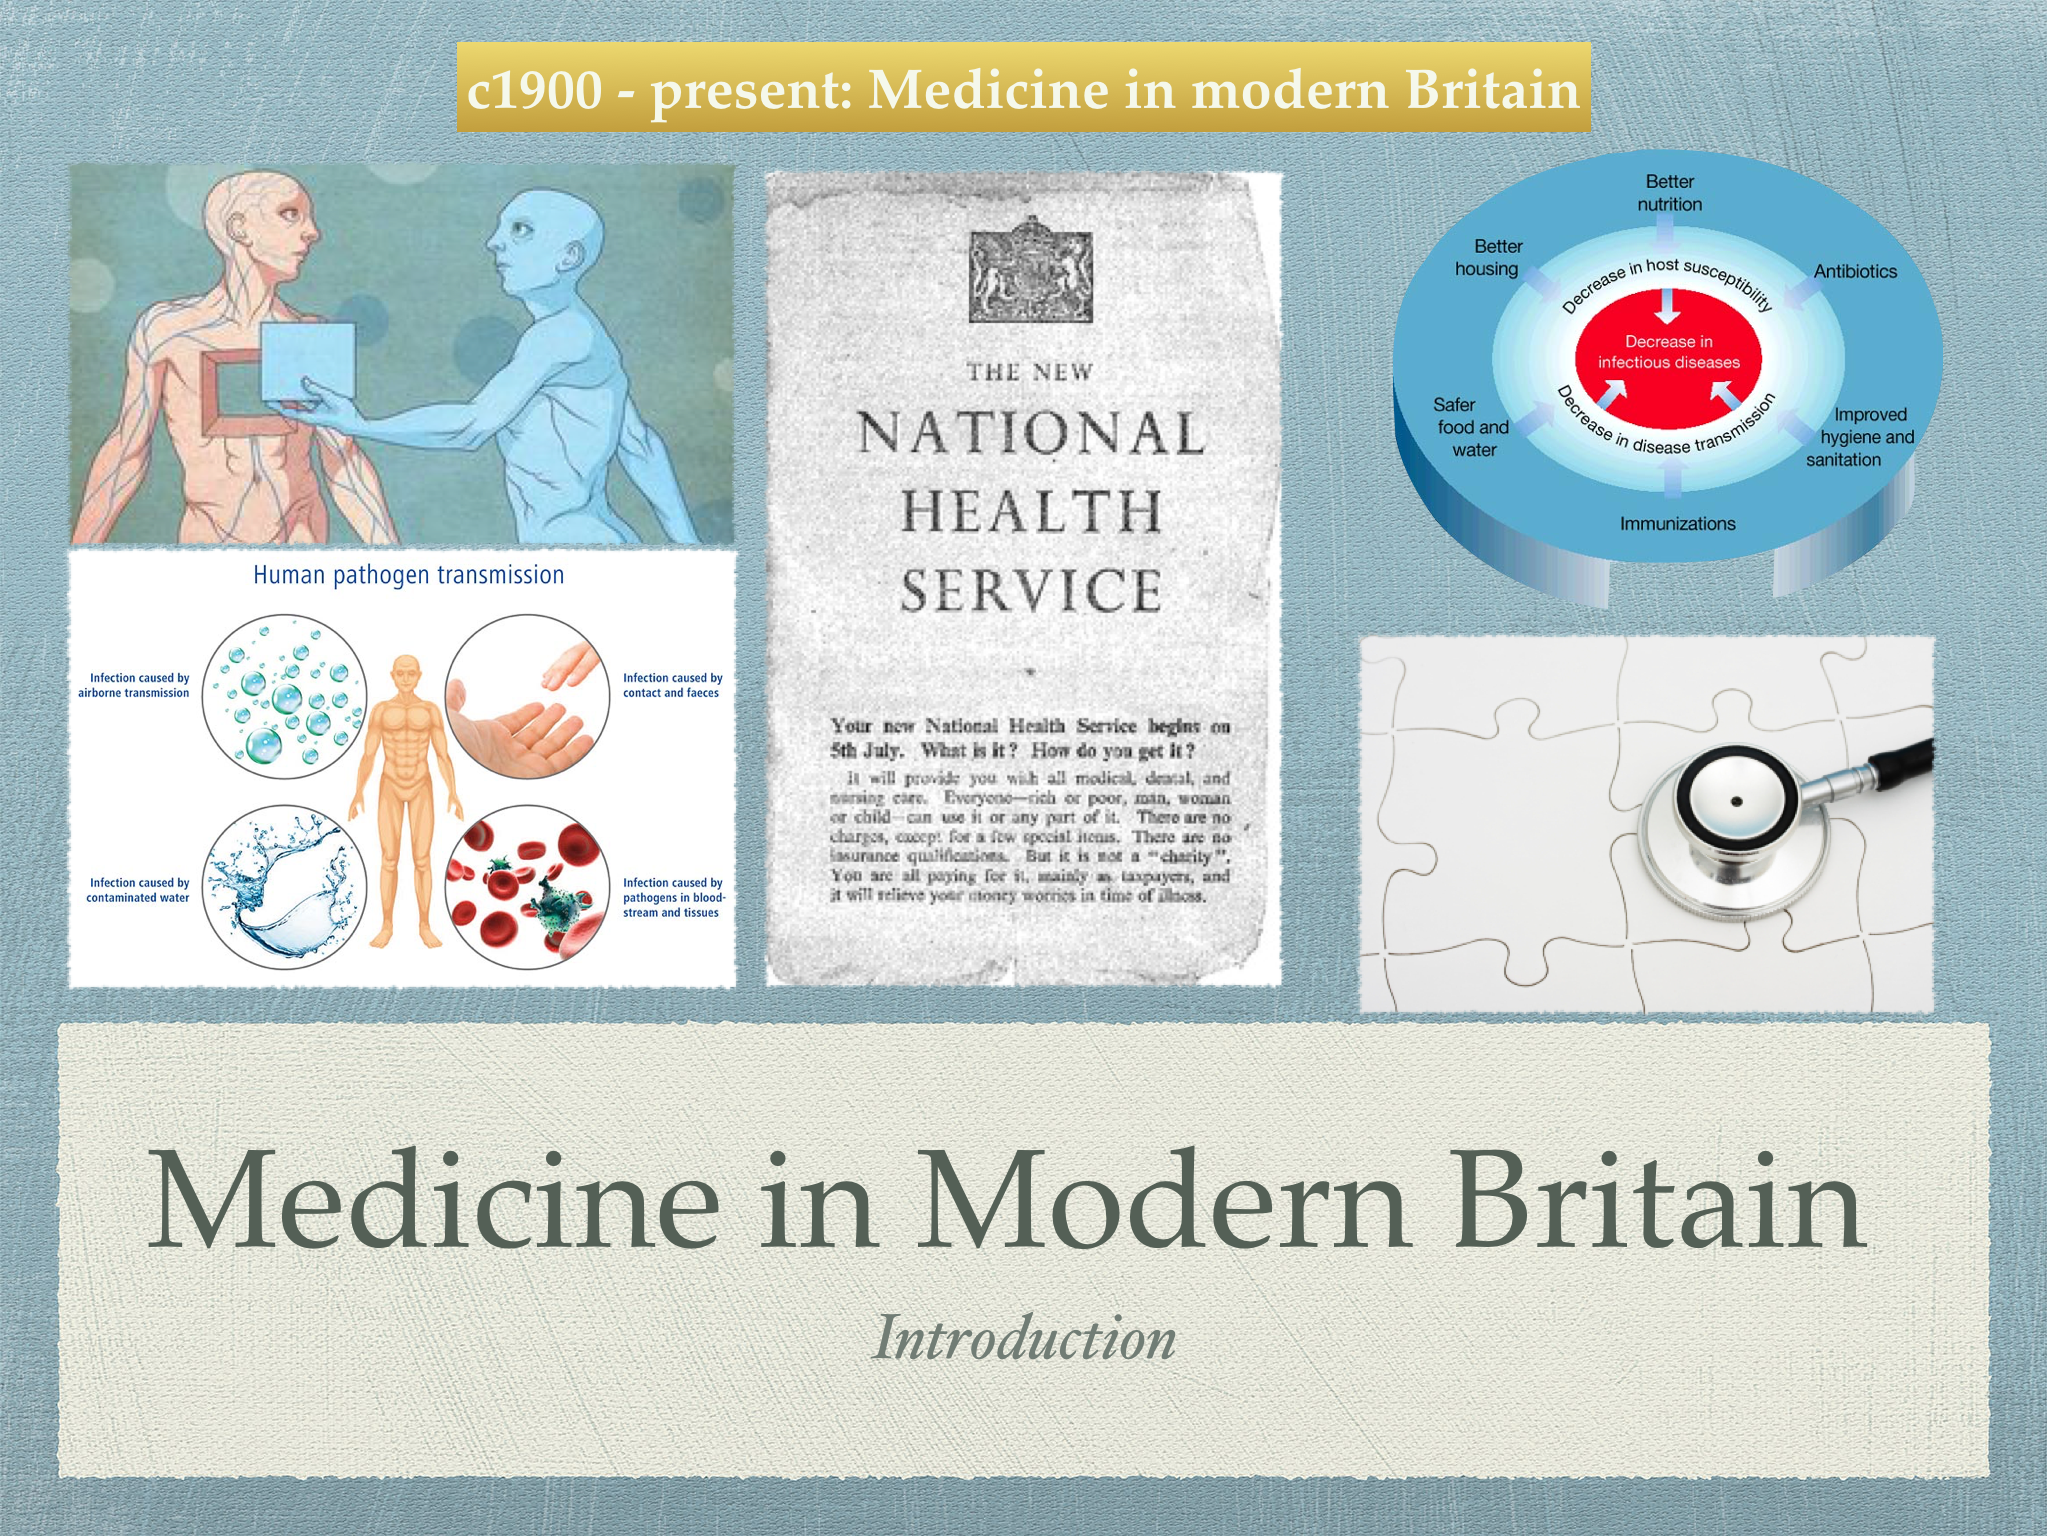 GCSE History of Medicine. Unit 4. 20th Century.